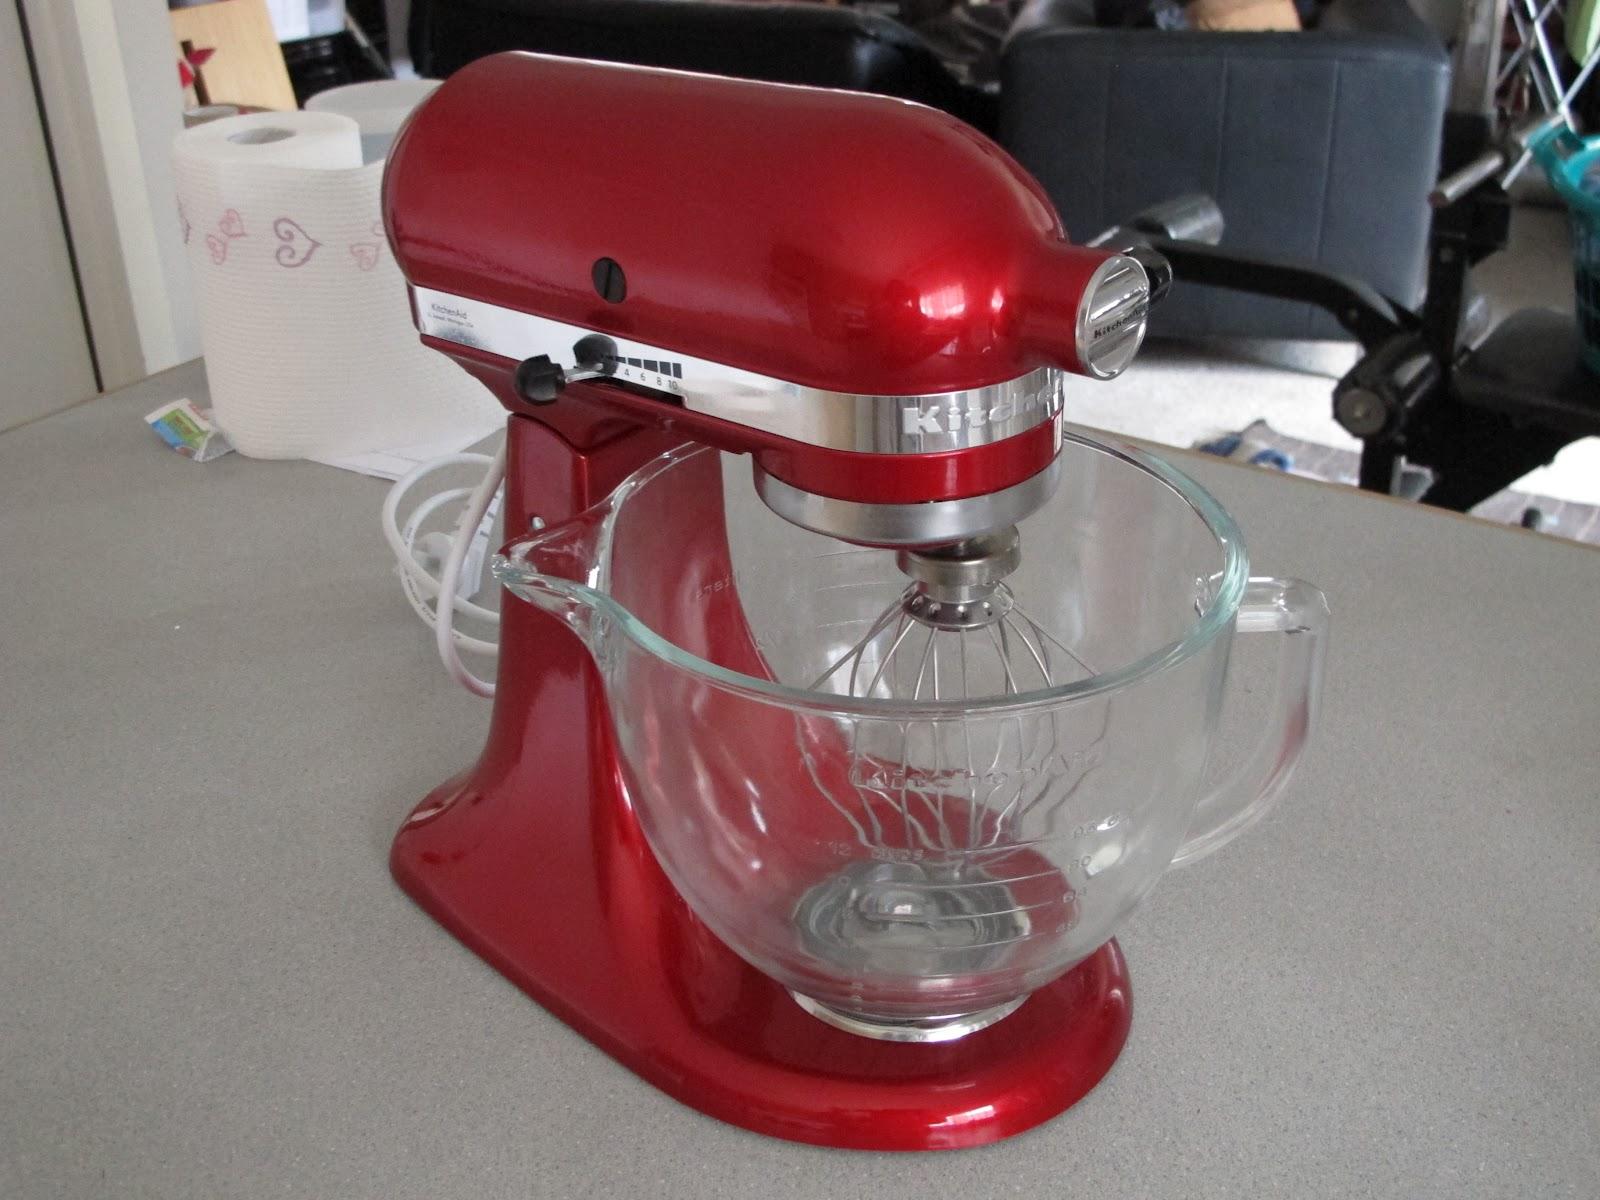 jojo's crafty love: Candy Apple Red Kitchenaid Platinum Collection